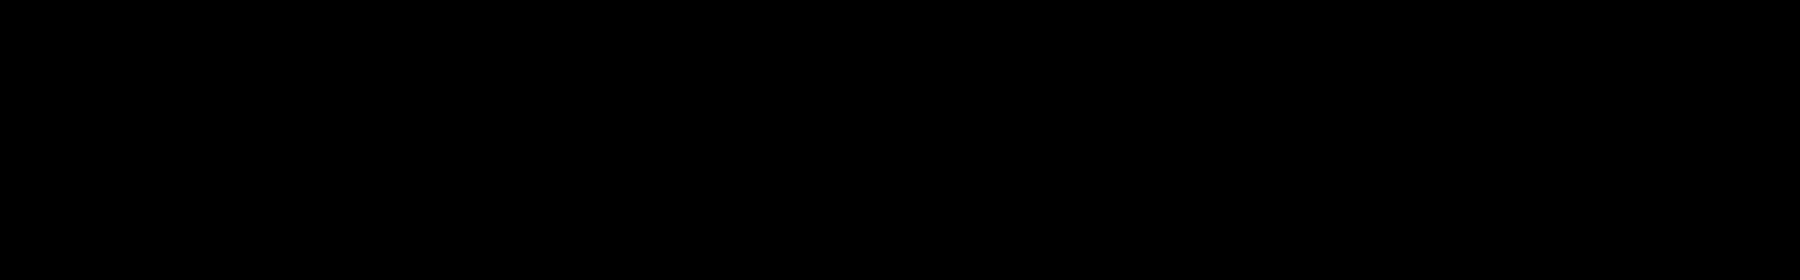 System Techno audio waveform